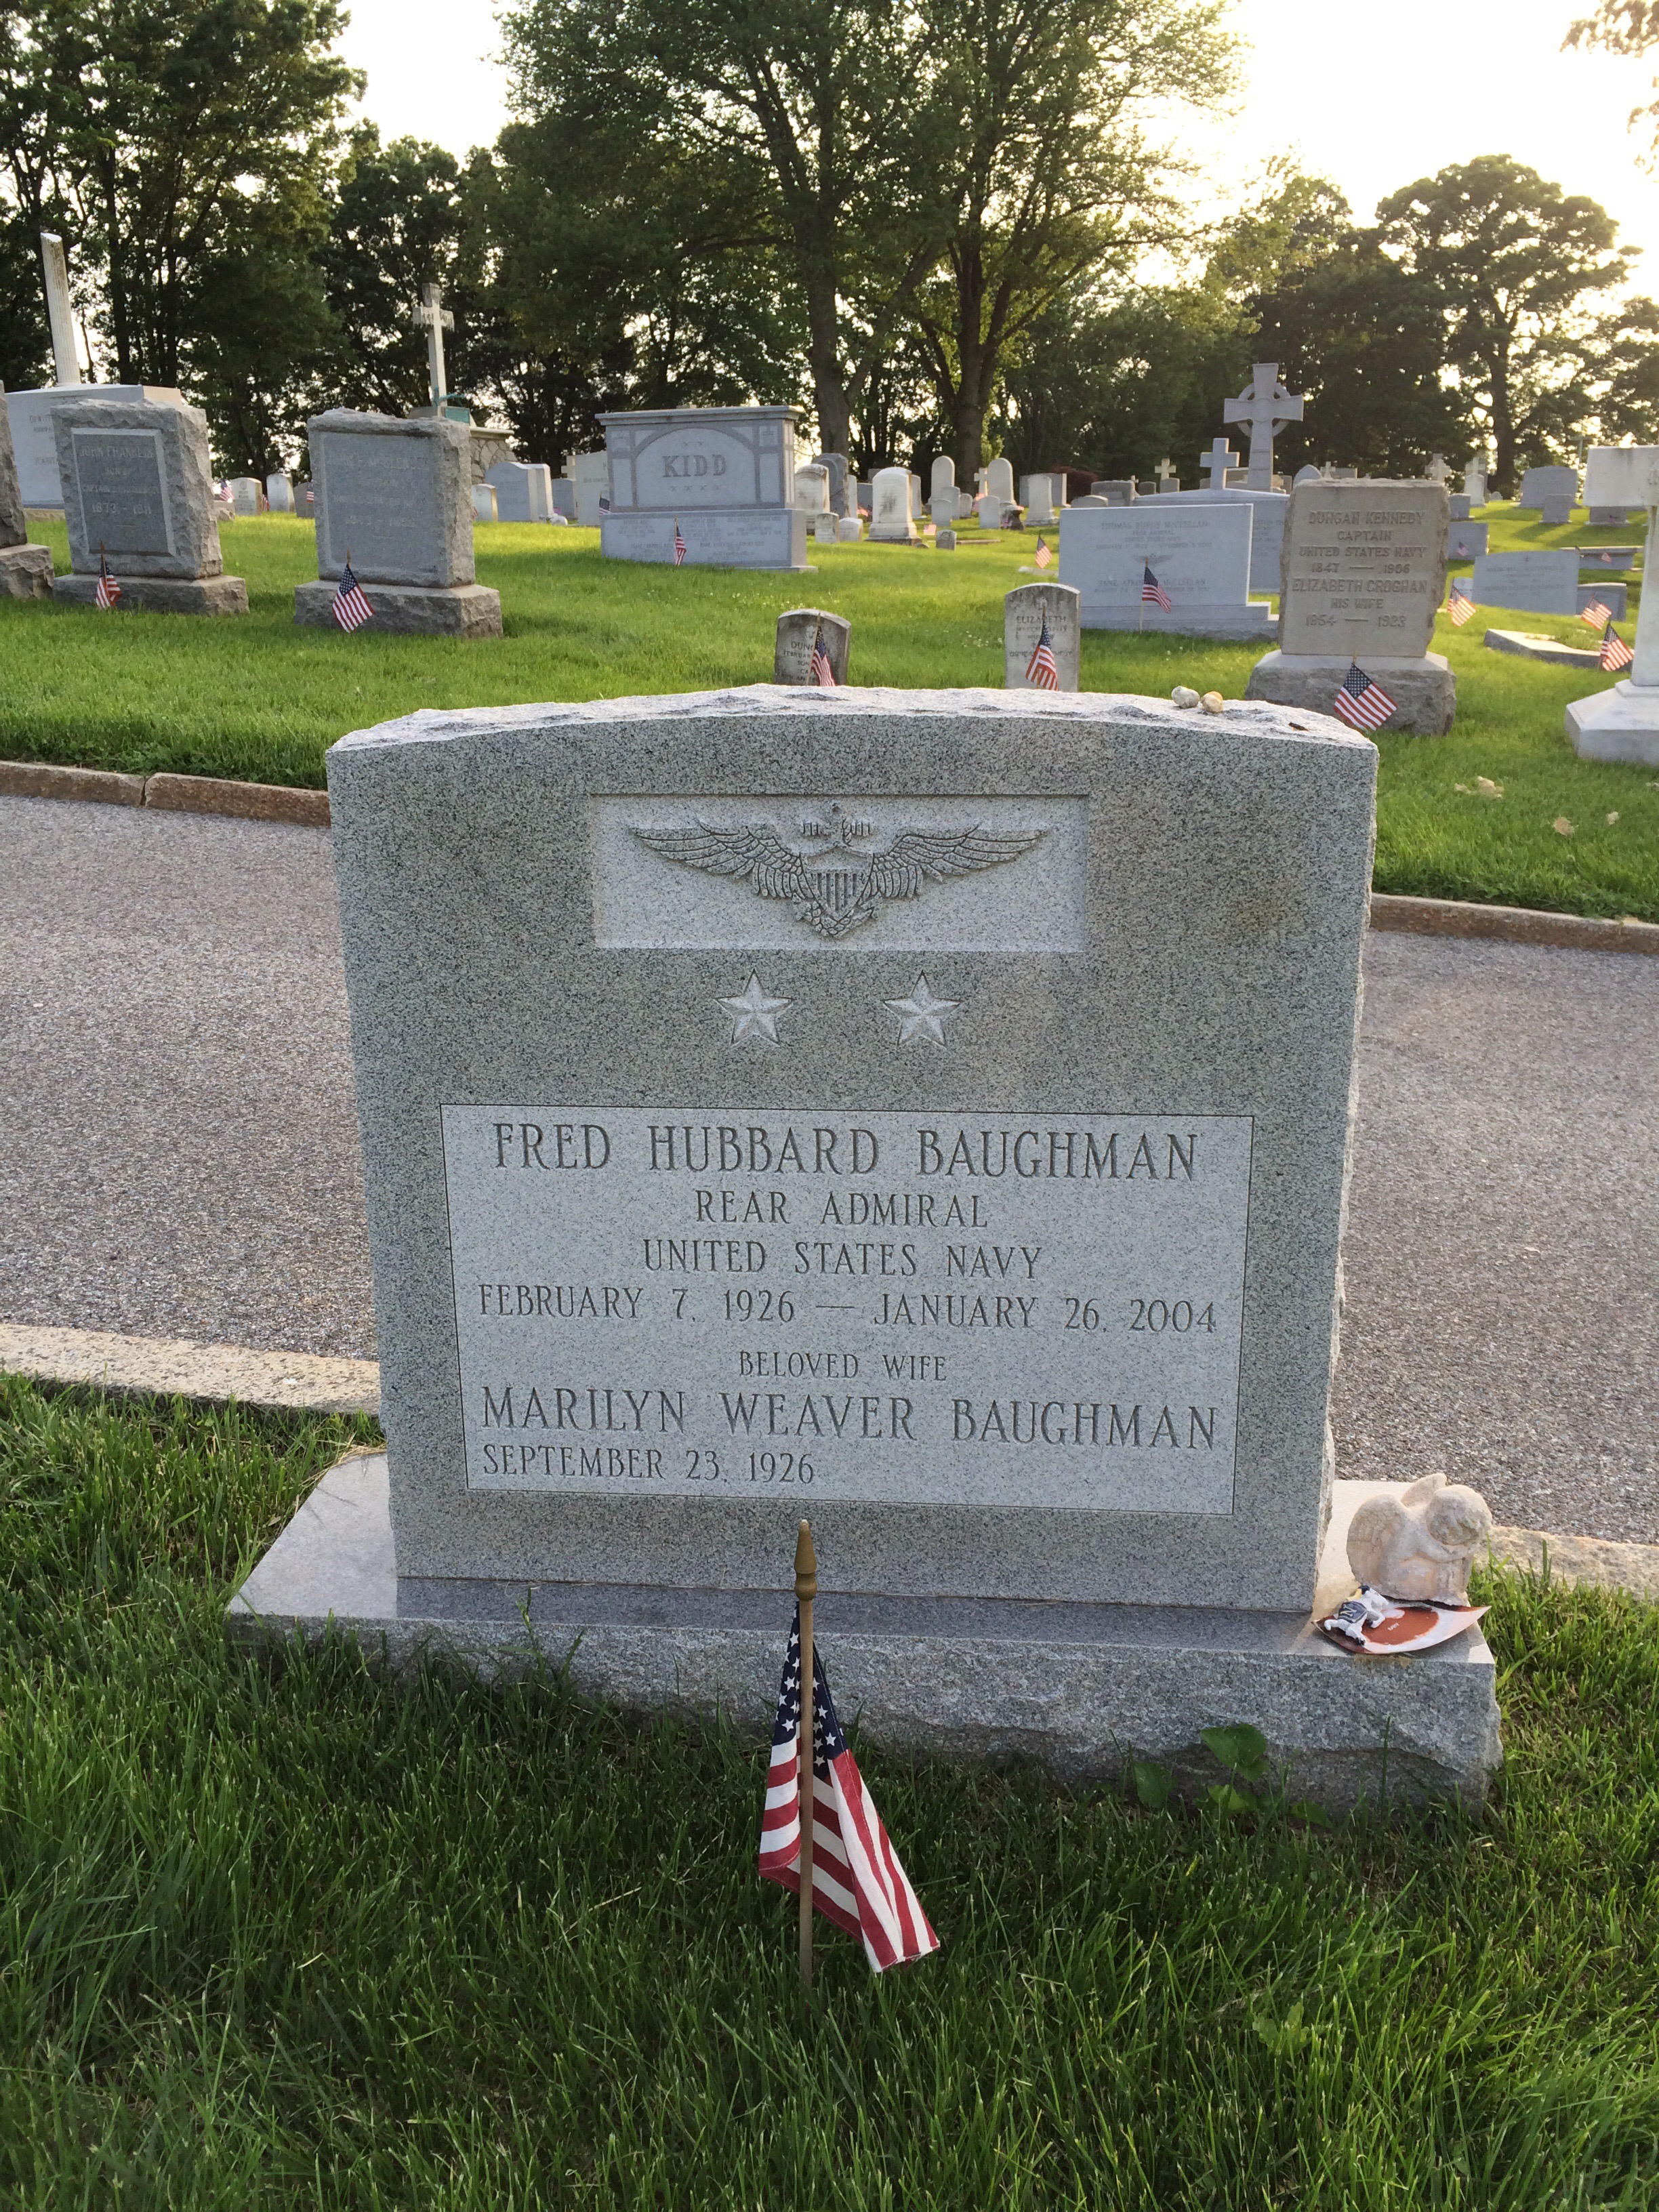 RADM Fred Hubbard Baughman